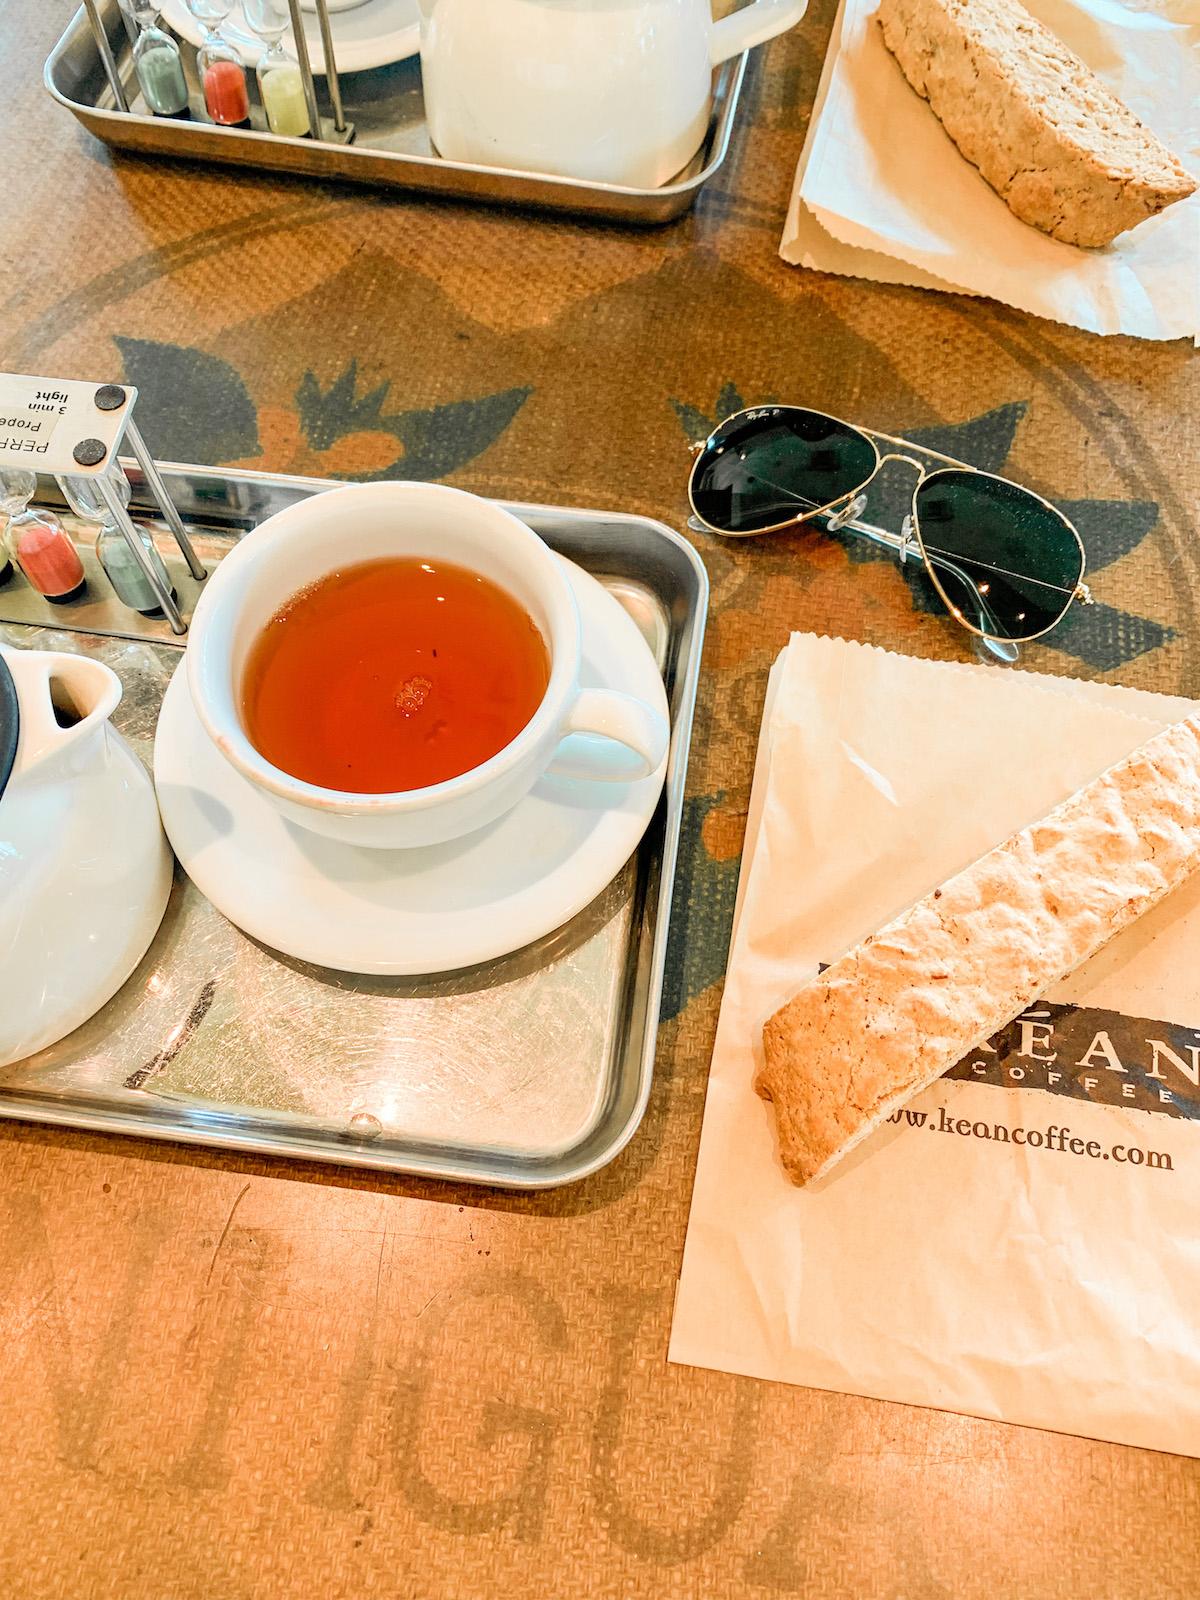 kean coffee newport beach